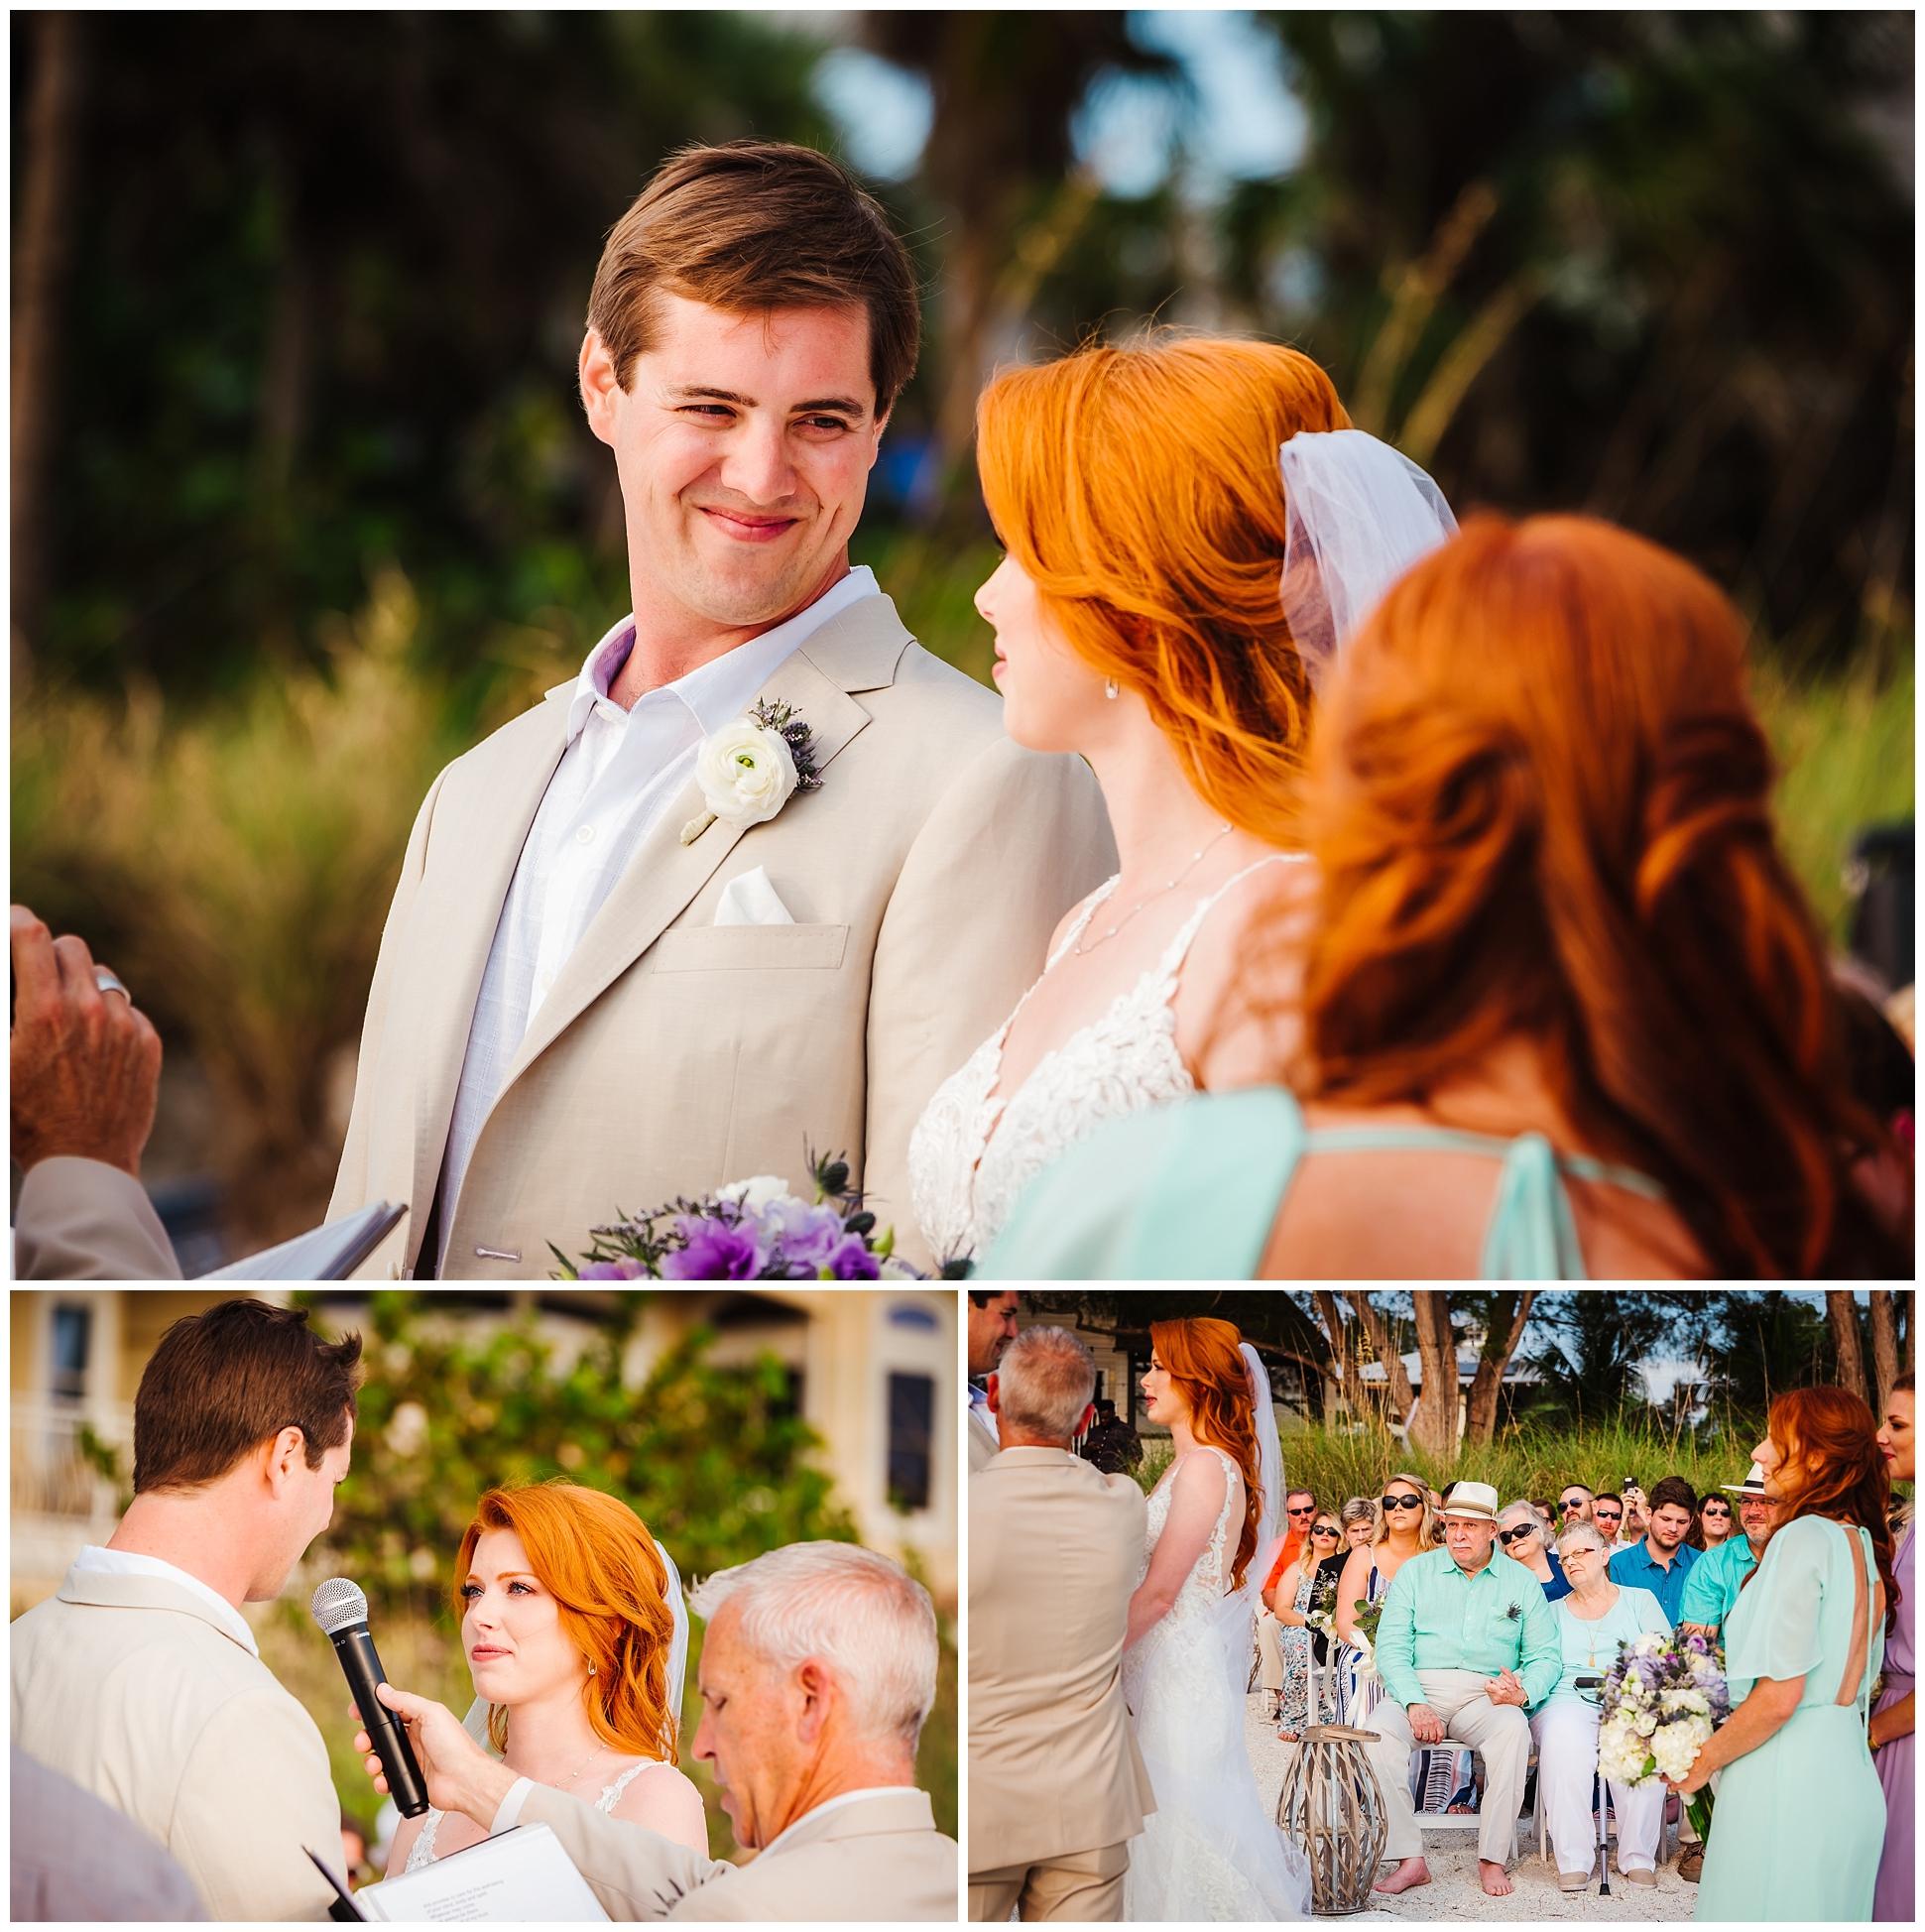 tampa-st-pete-wedding-photographer-indian-rocks-beach-mermaid-train-redhead_0136.jpg